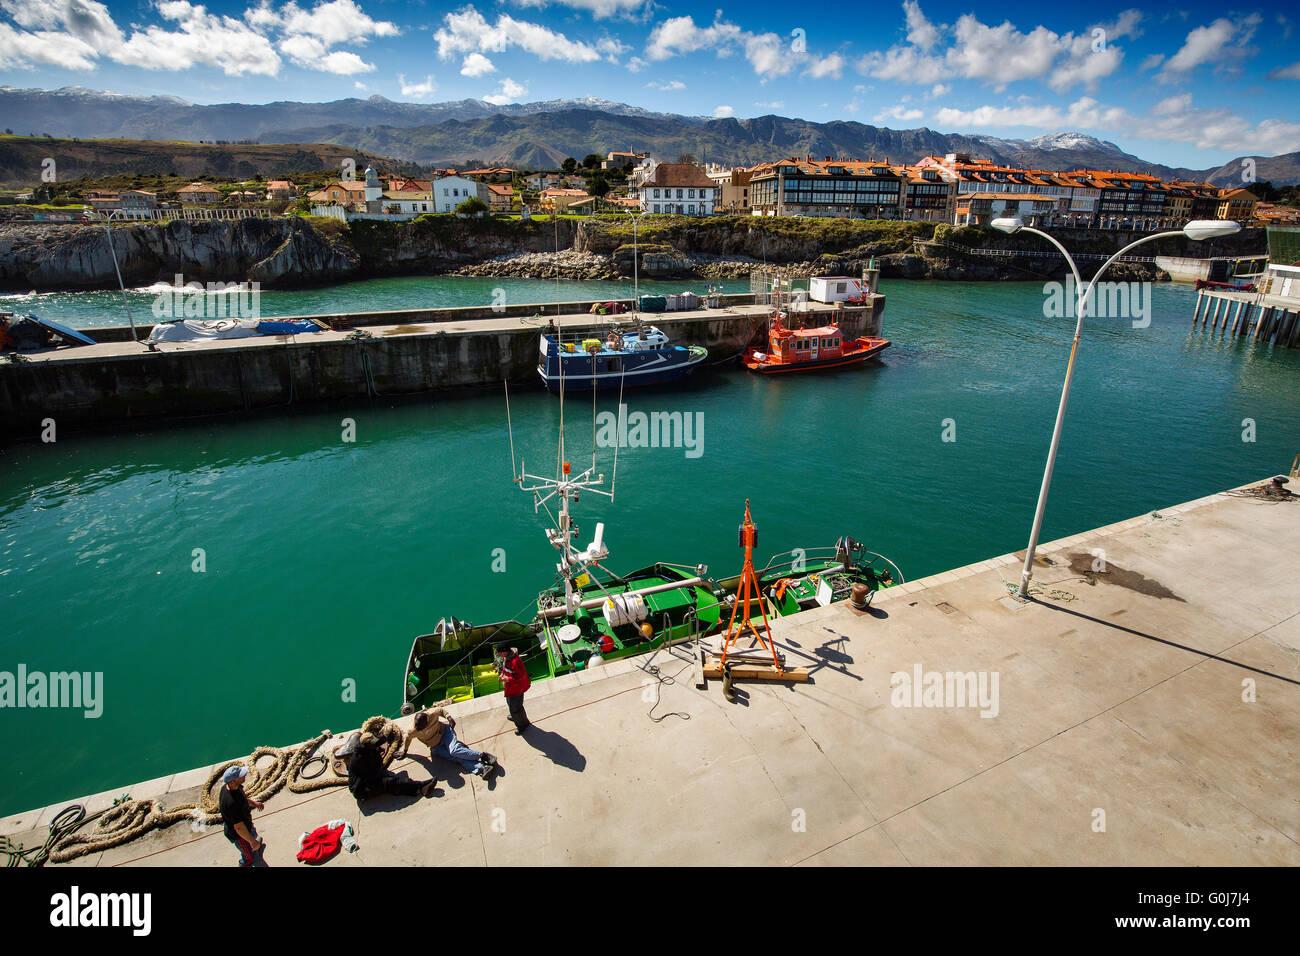 Fishing port Marina. Fishing village of Llanes, Cantabrian Sea, Asturias, Spain Europe - Stock Image